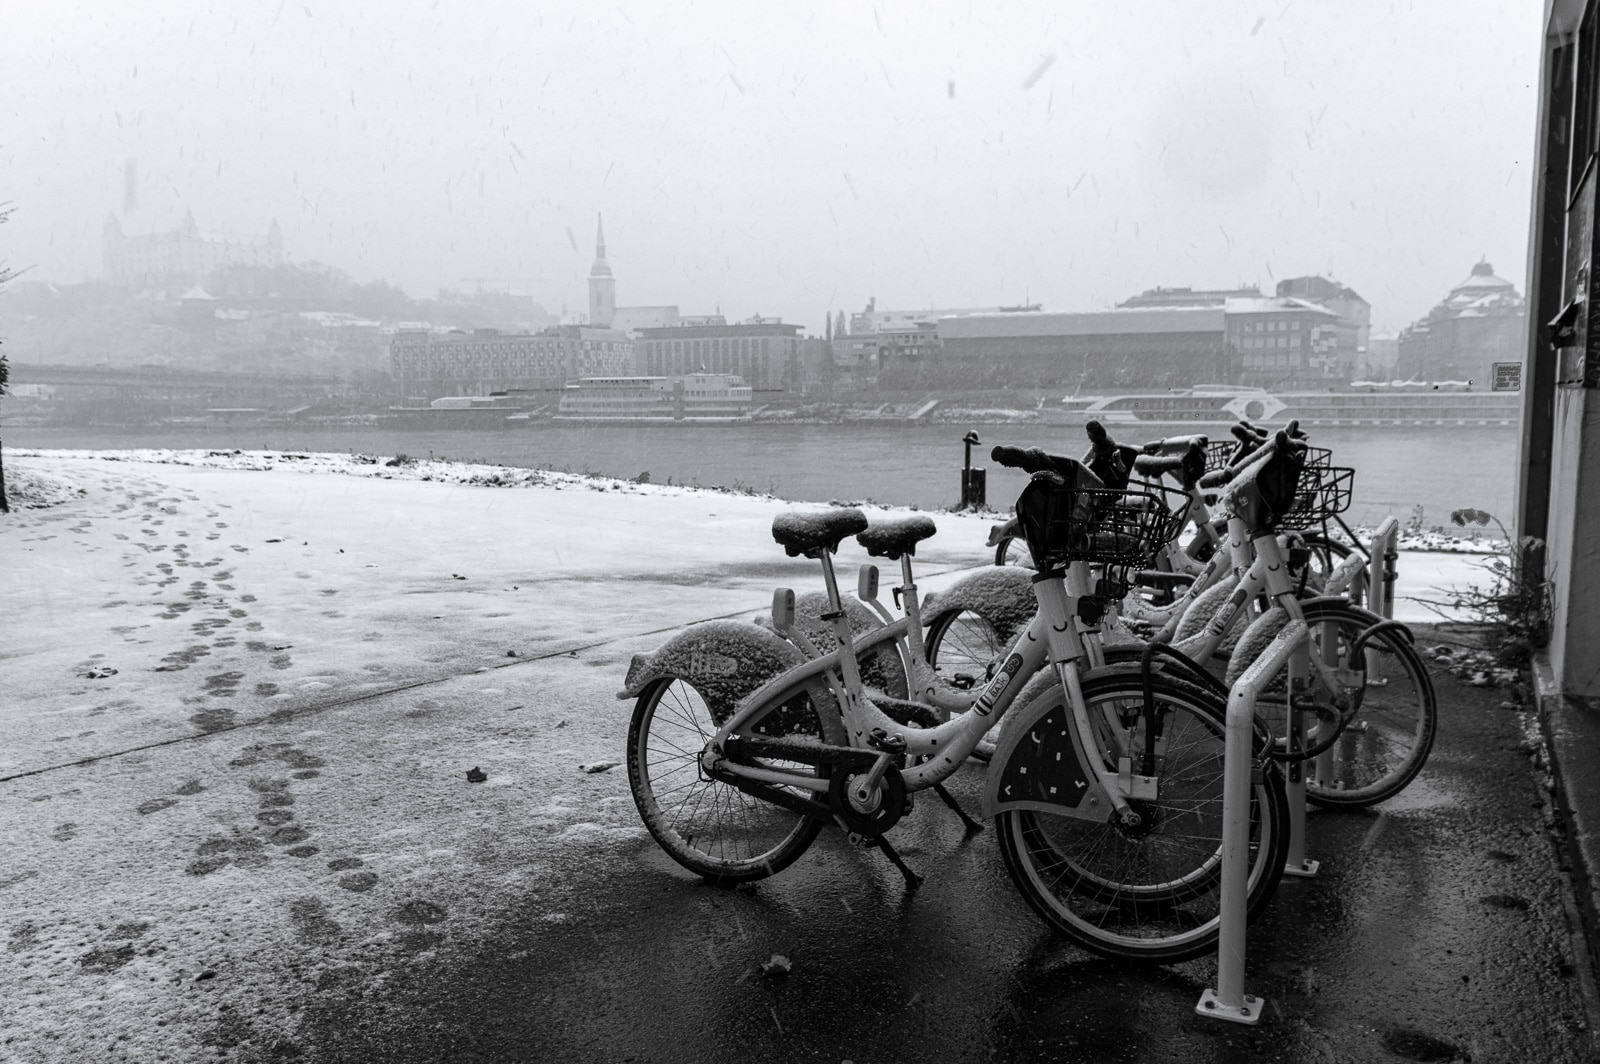 bicycles parked by river Danube in Bratislava